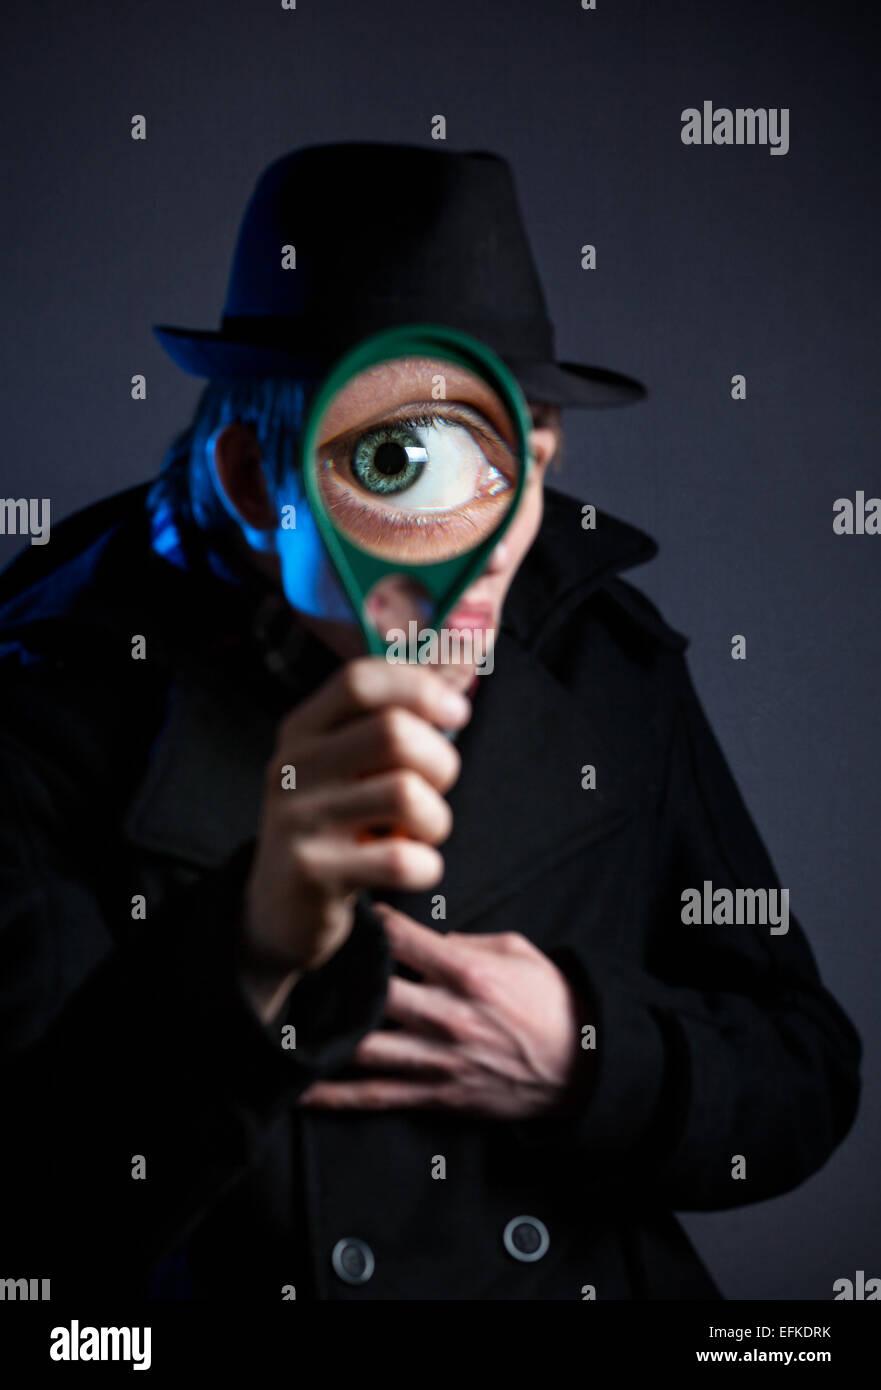 Hombre de negro hat con lupa cristal en fondo oscuro Imagen De Stock